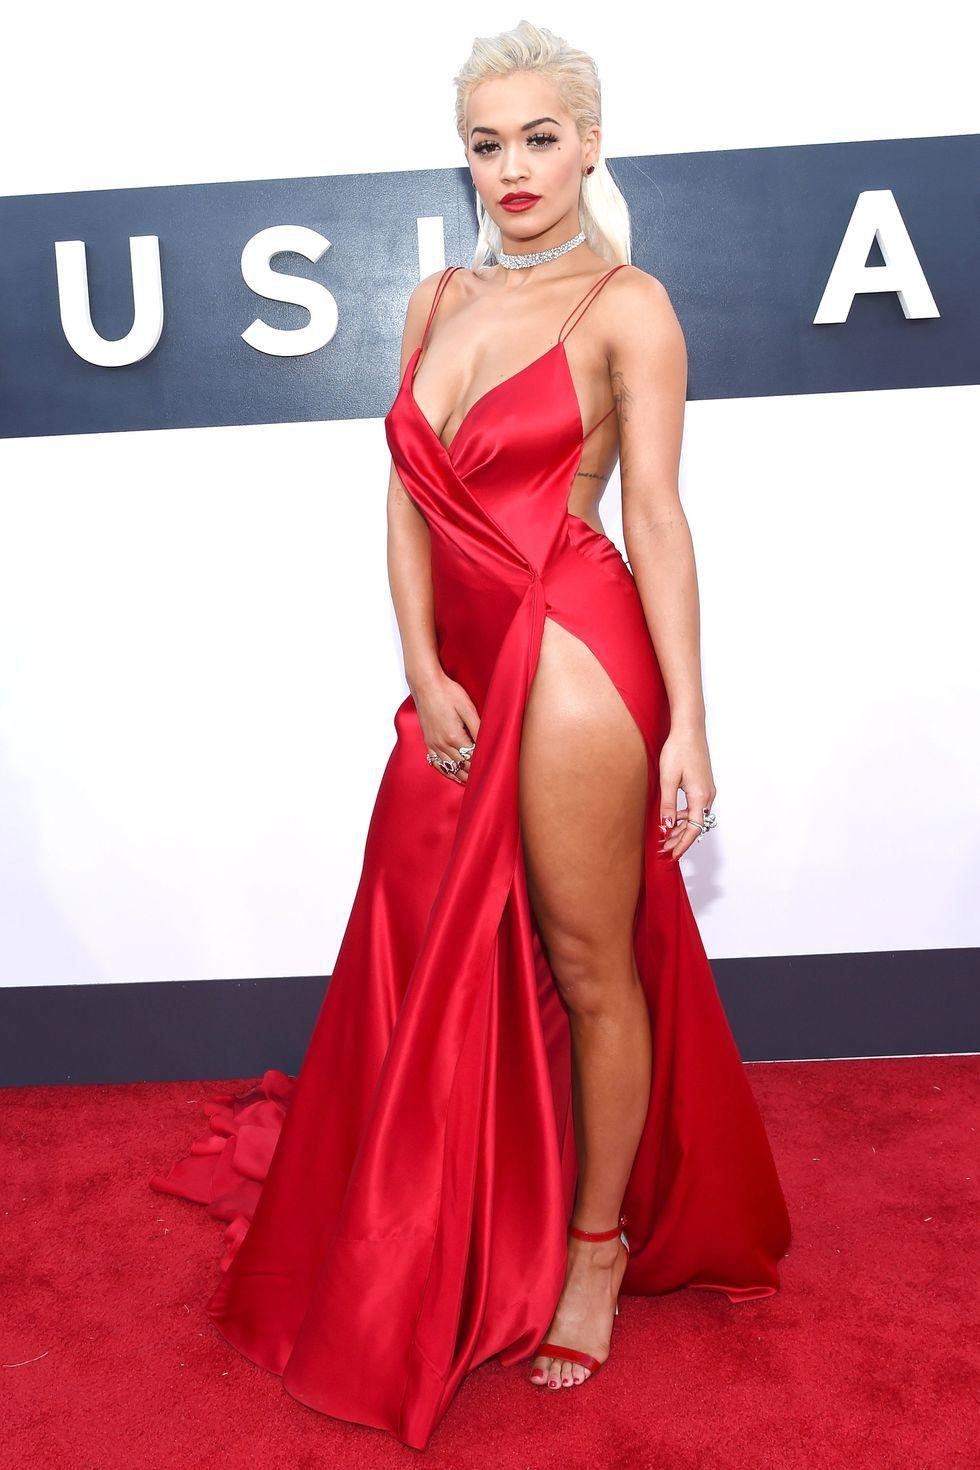 Gaya Seksi Artis Hollywood Pamer Paha Pakai Gaun Belahan Tinggi